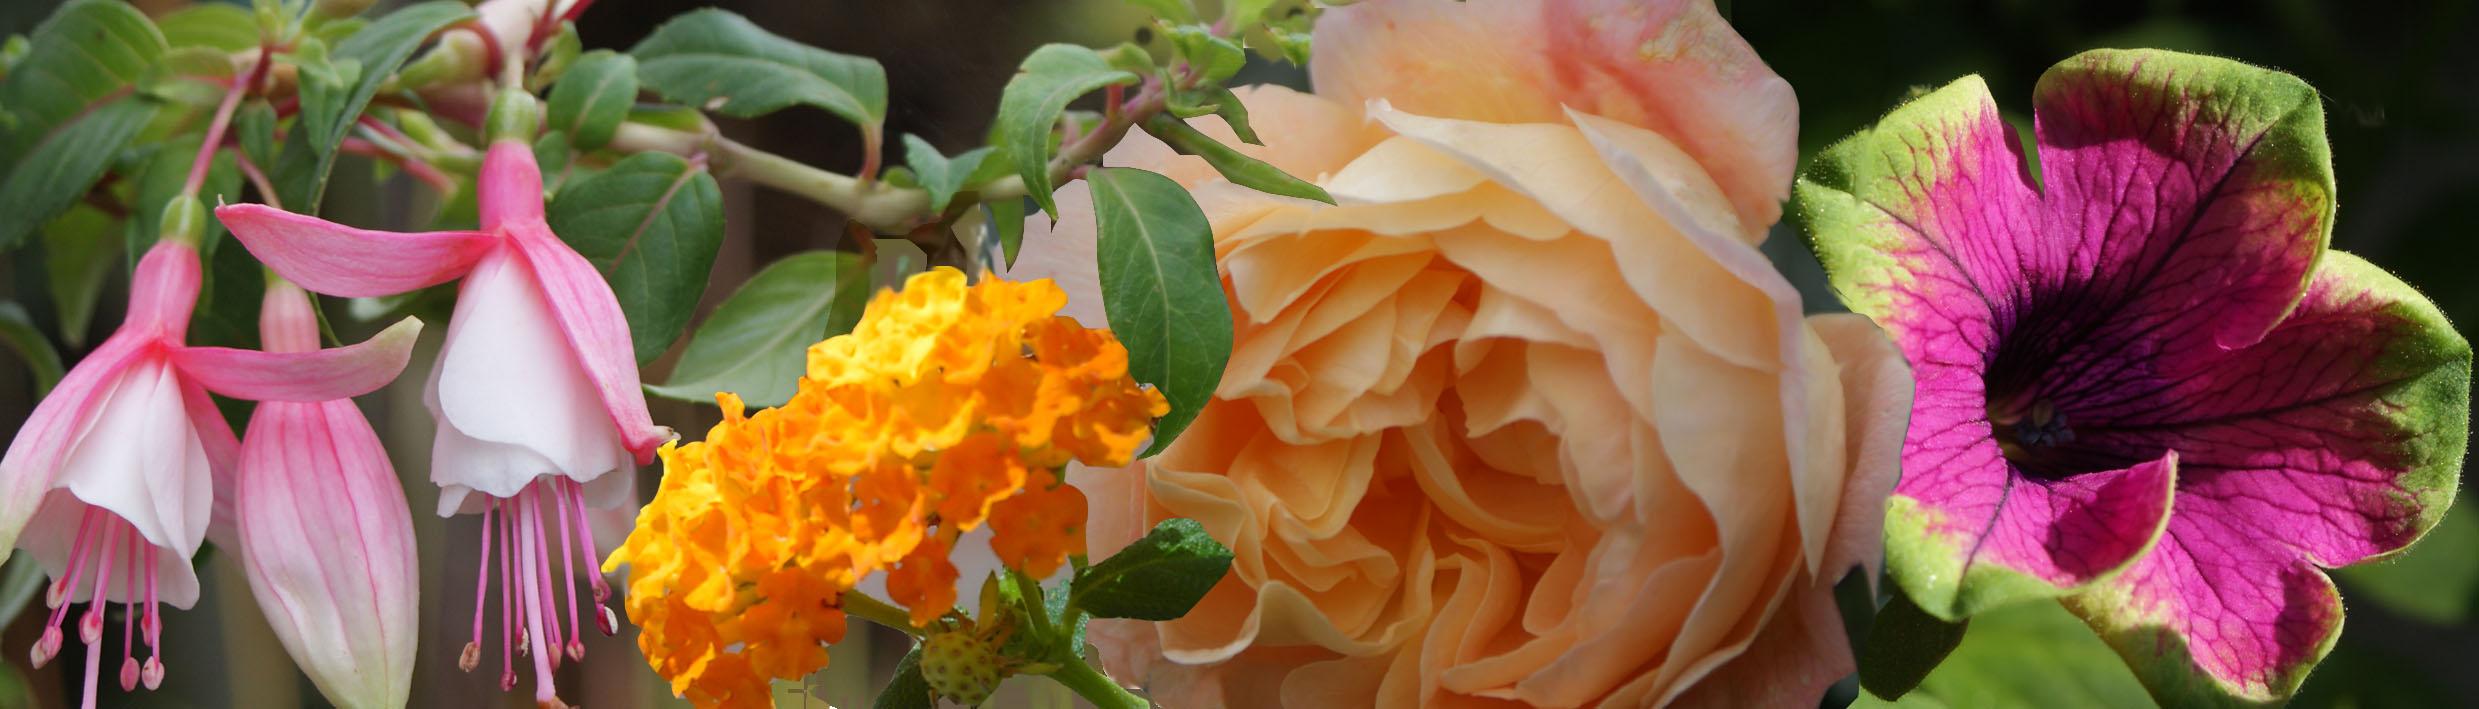 Garten & Balkonblumen